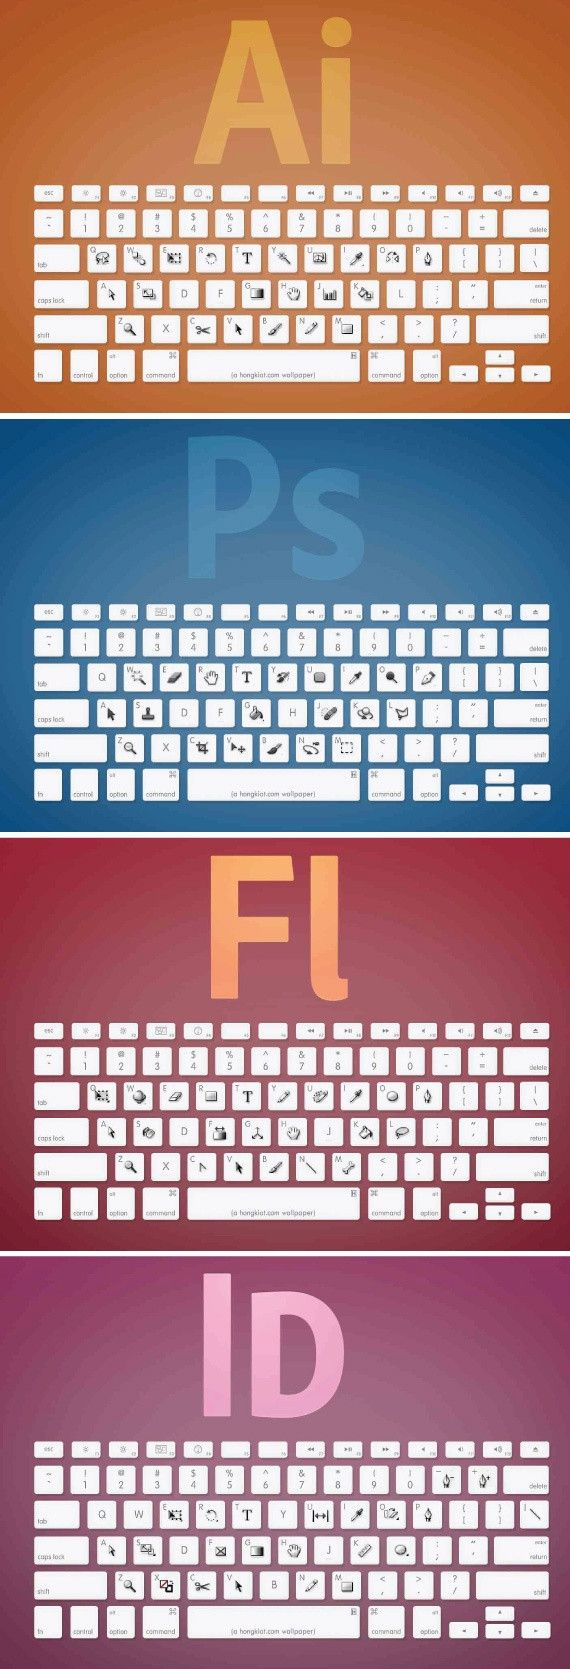 Adobe shortcuts | Things for Geeks